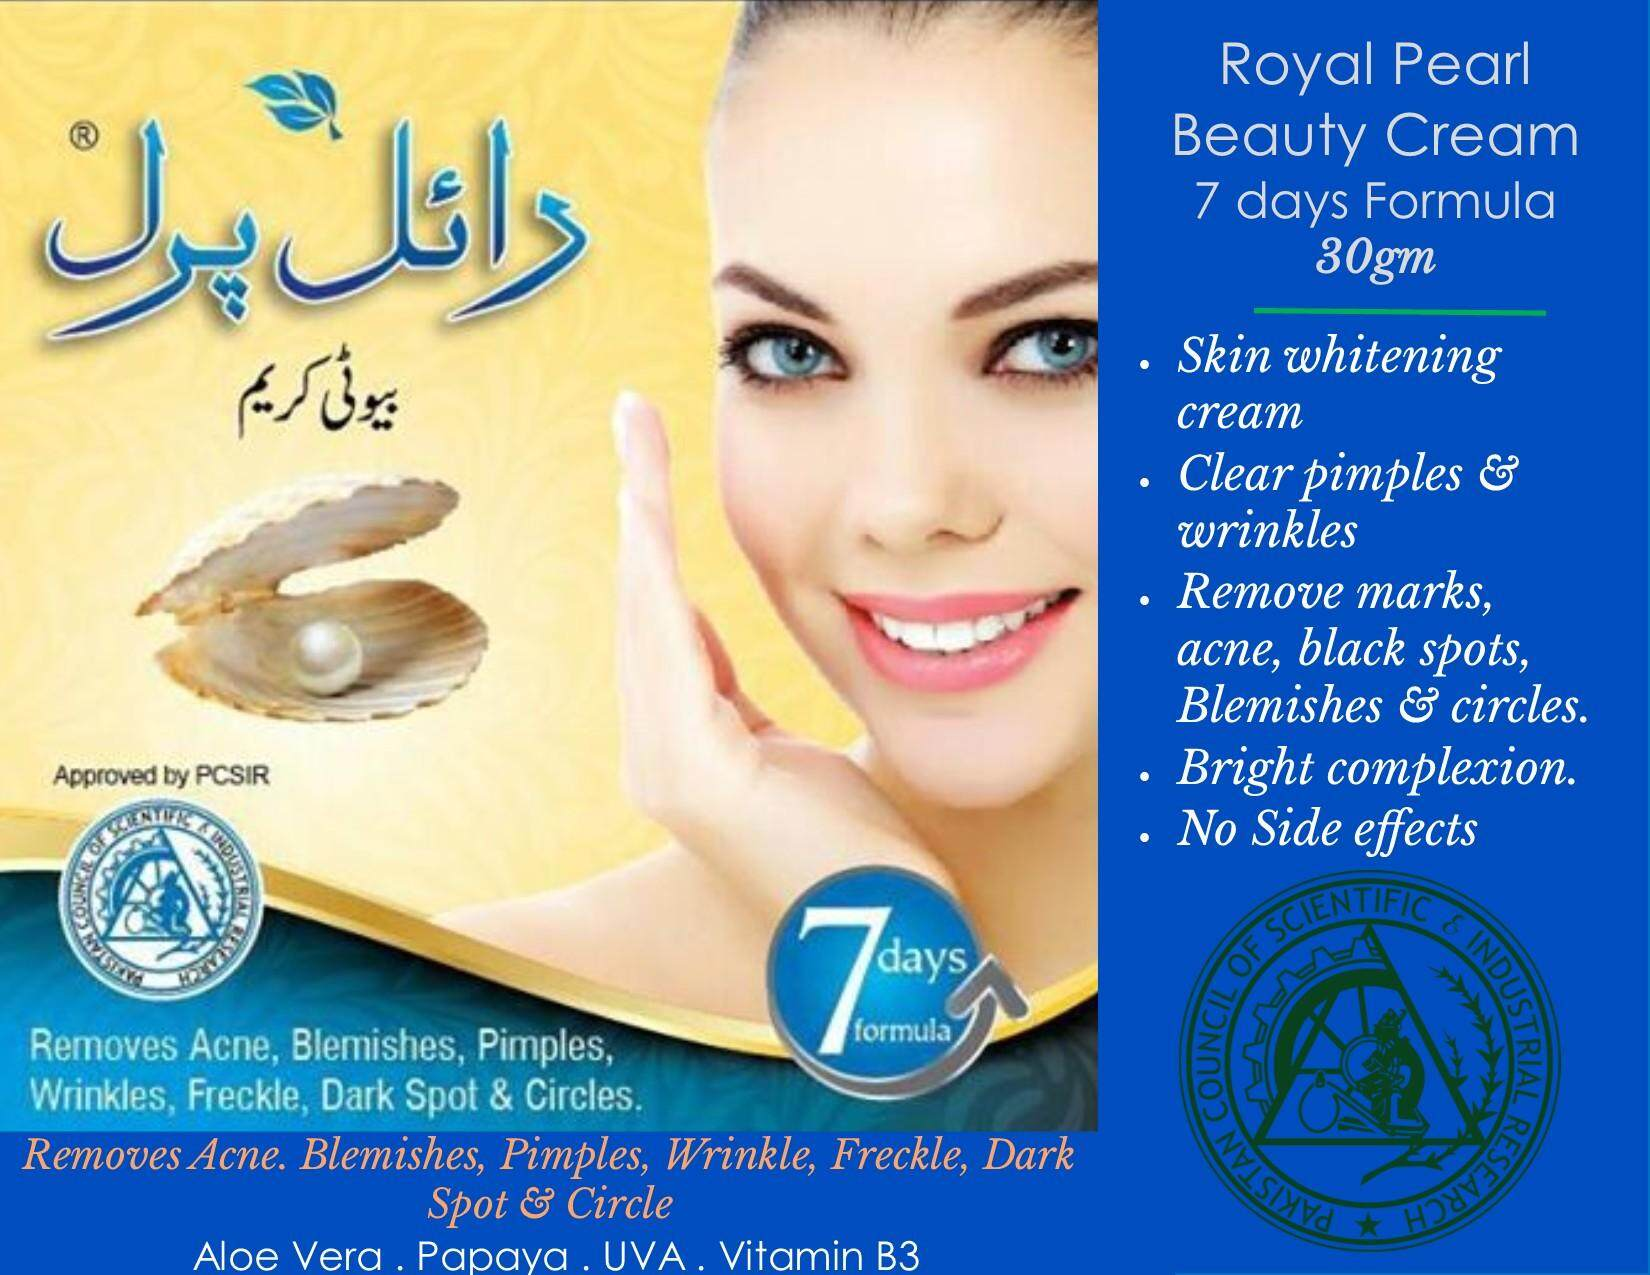 Royal Pearl Beauty Cream 7 Days Formula 30gm By Raison- Raihan Maju Empire.